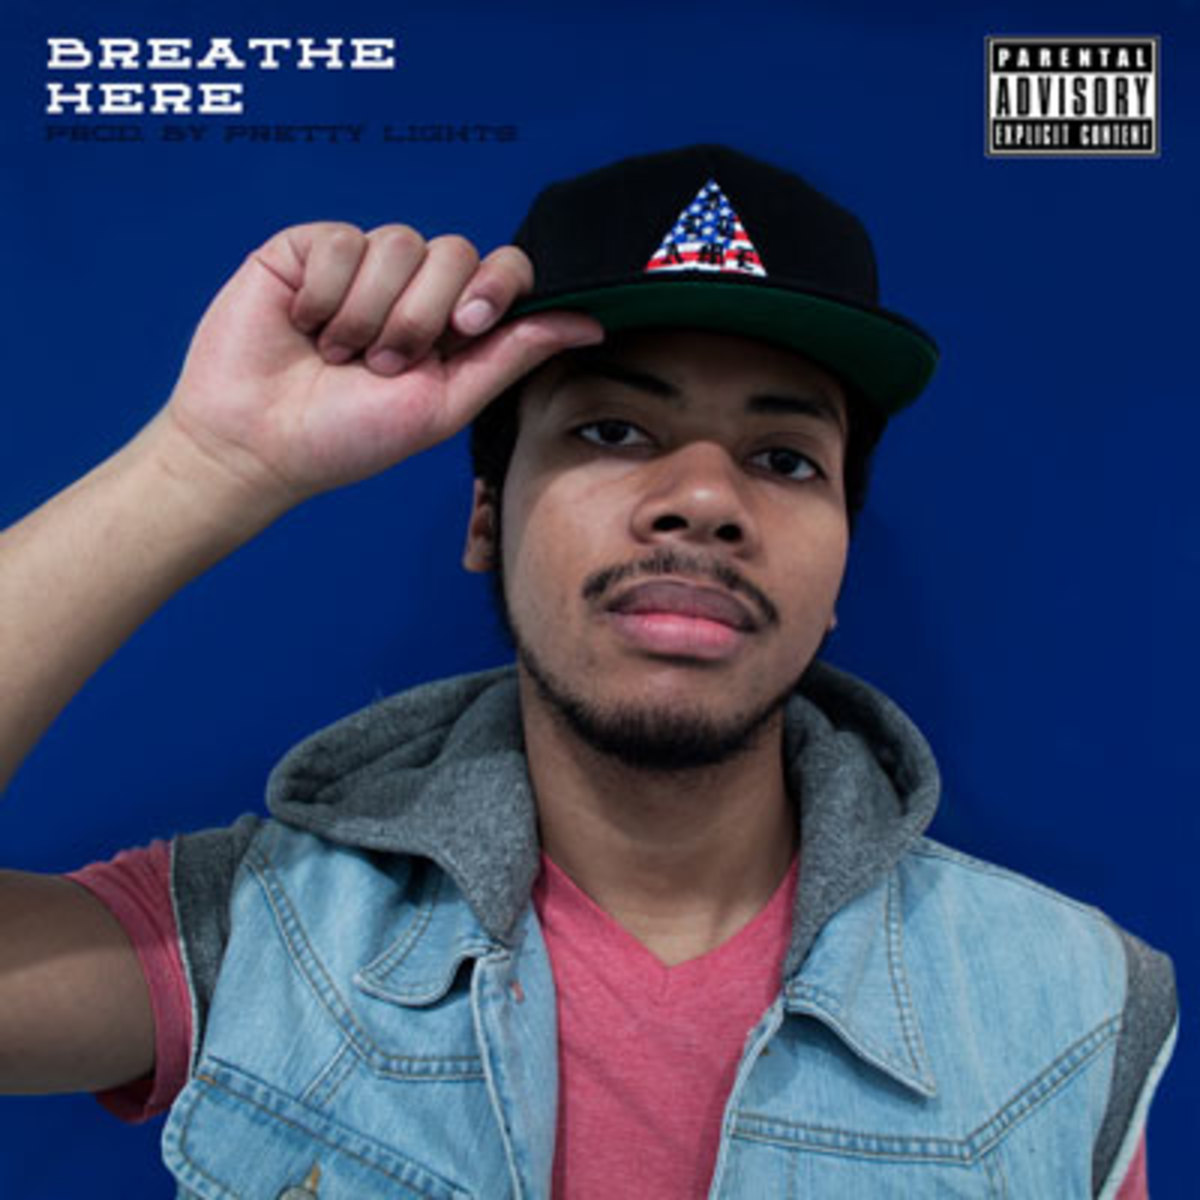 ajcrew-breathehere.jpg